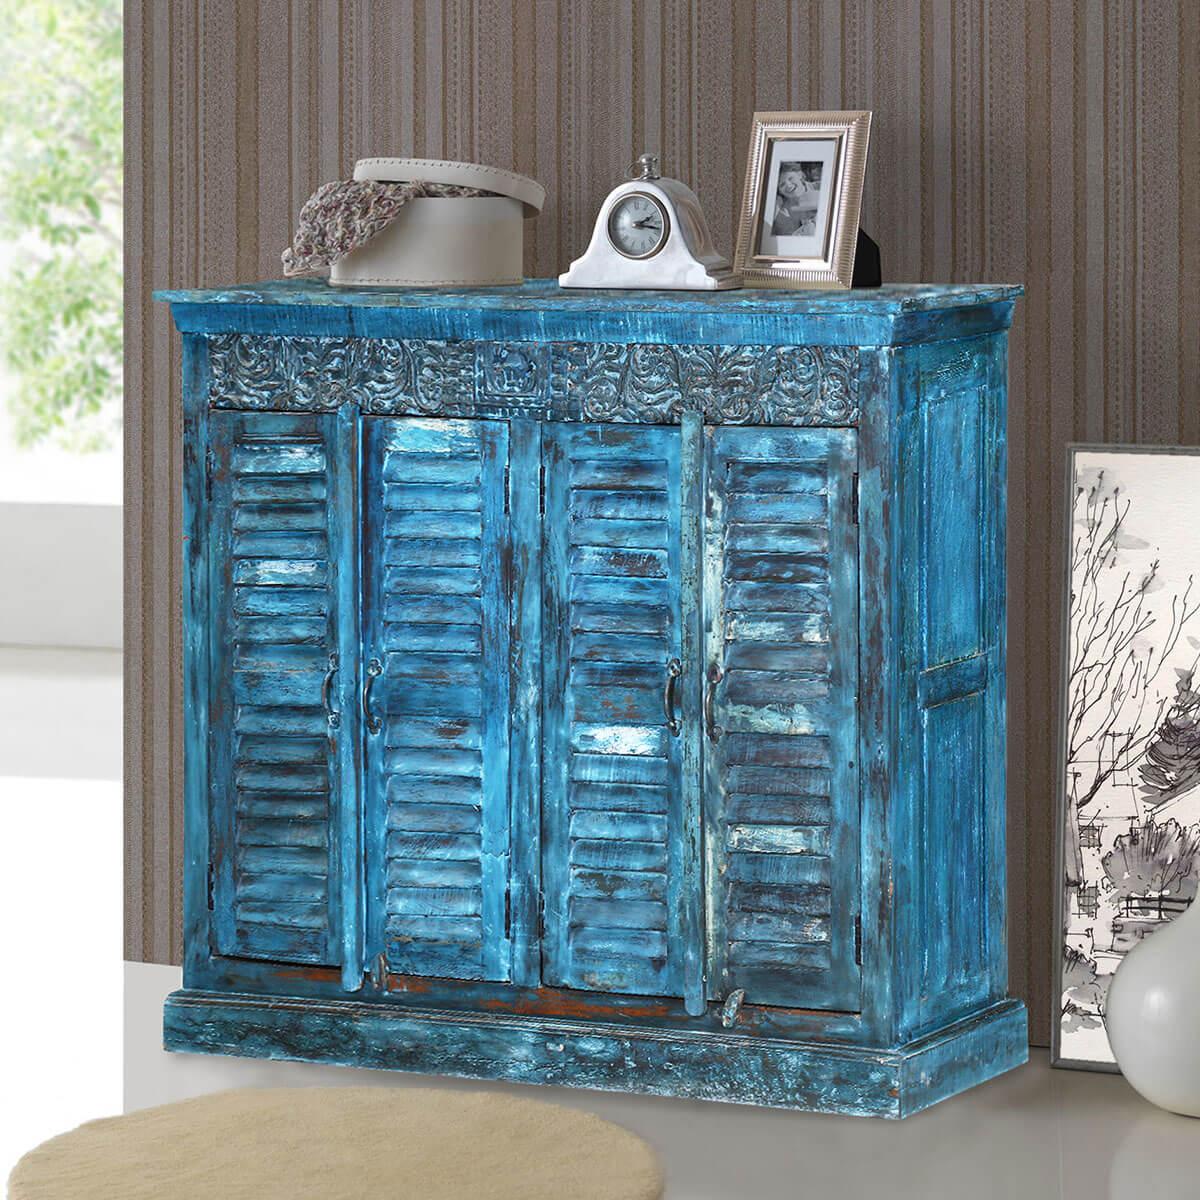 Midnight Blue Reclaimed Wood Shutter Door Sideboard Cabinet - Tucson 72